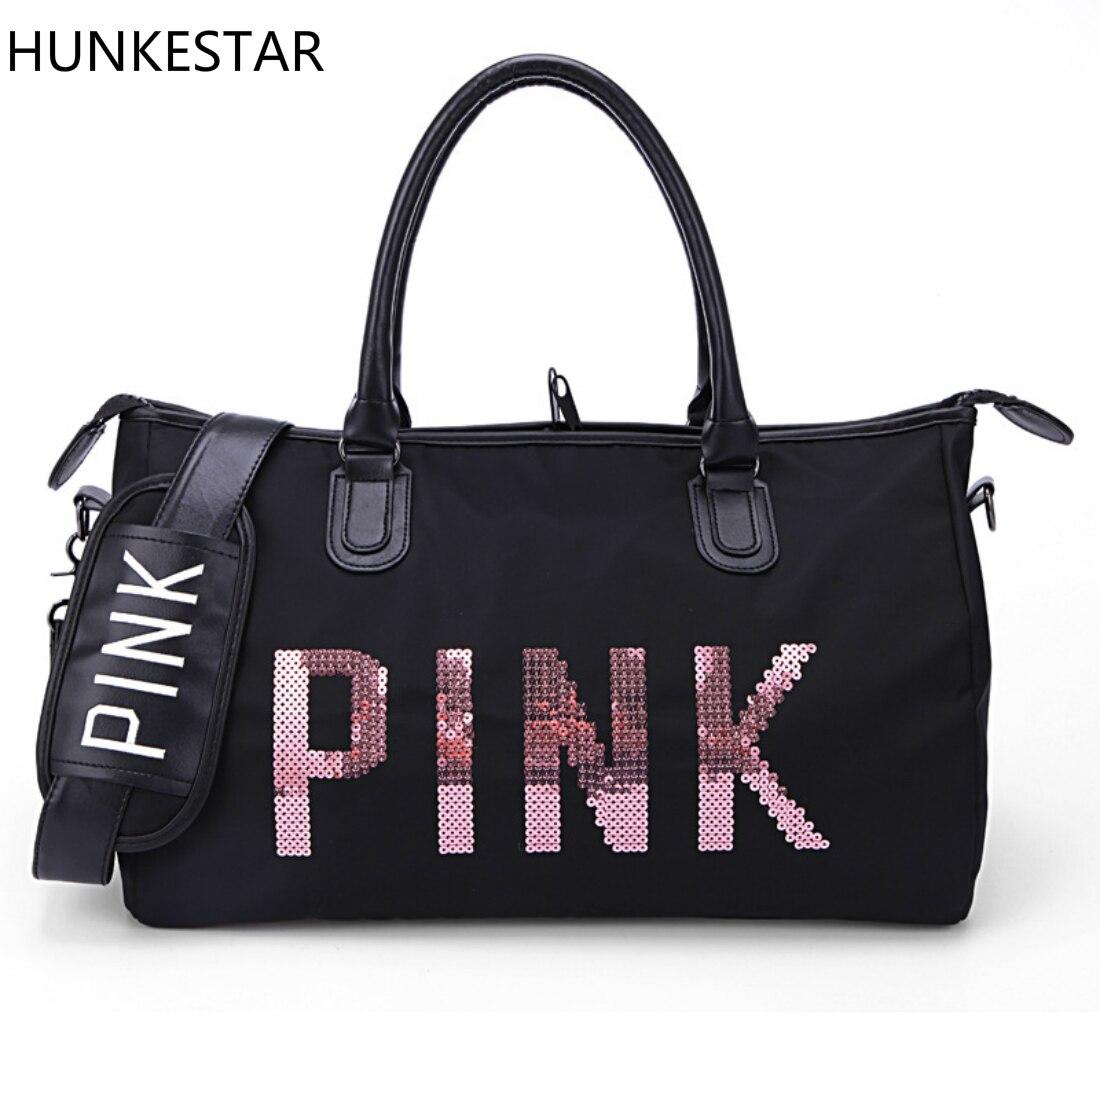 2018 Black Sequins Love PINK Duffle Bag Women Gym Bags Tote Beach Handbag Travel Shoulder Bags traing bag цены